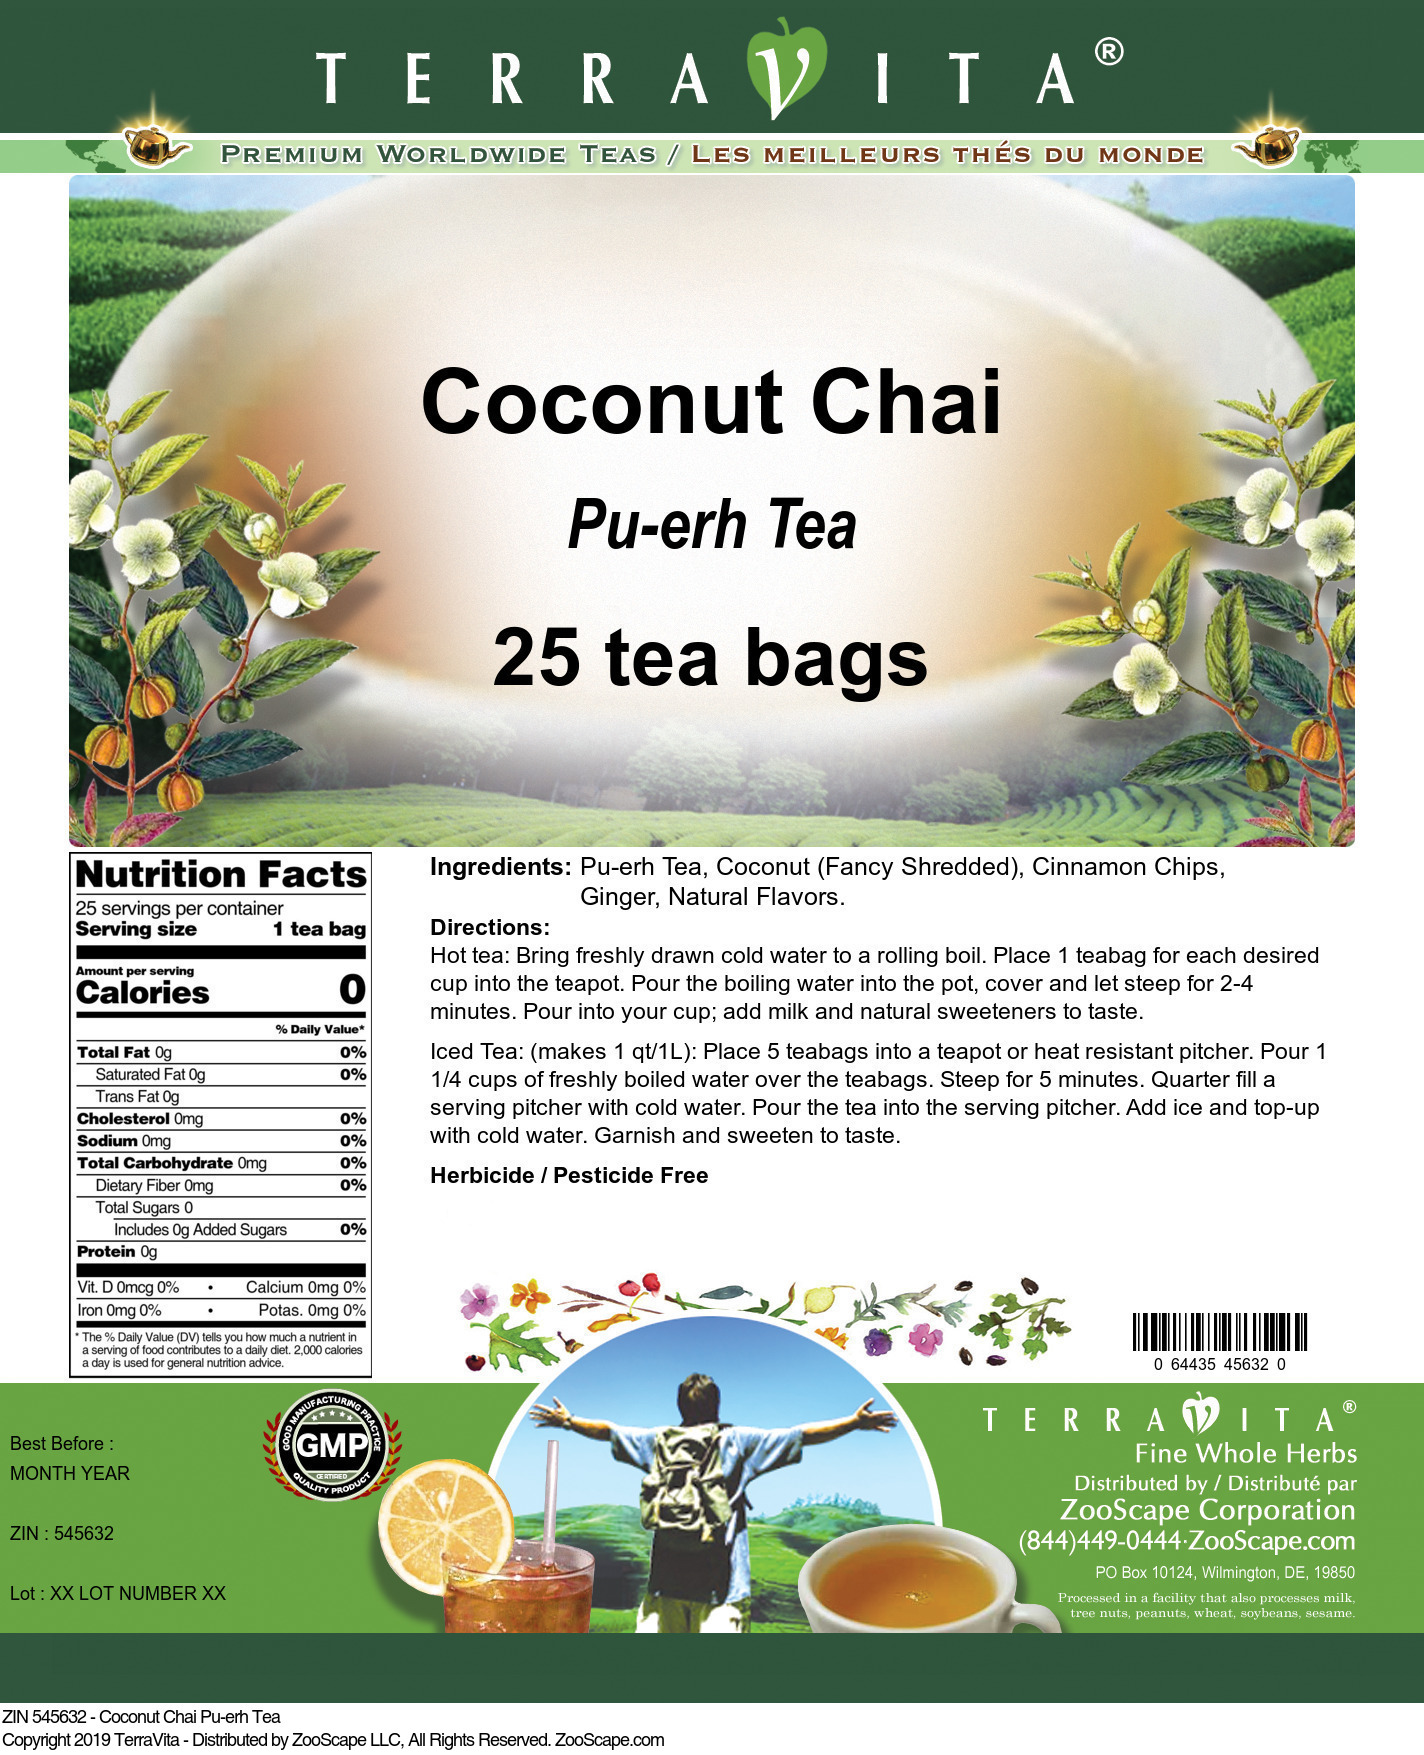 Coconut Chai Pu-erh Tea